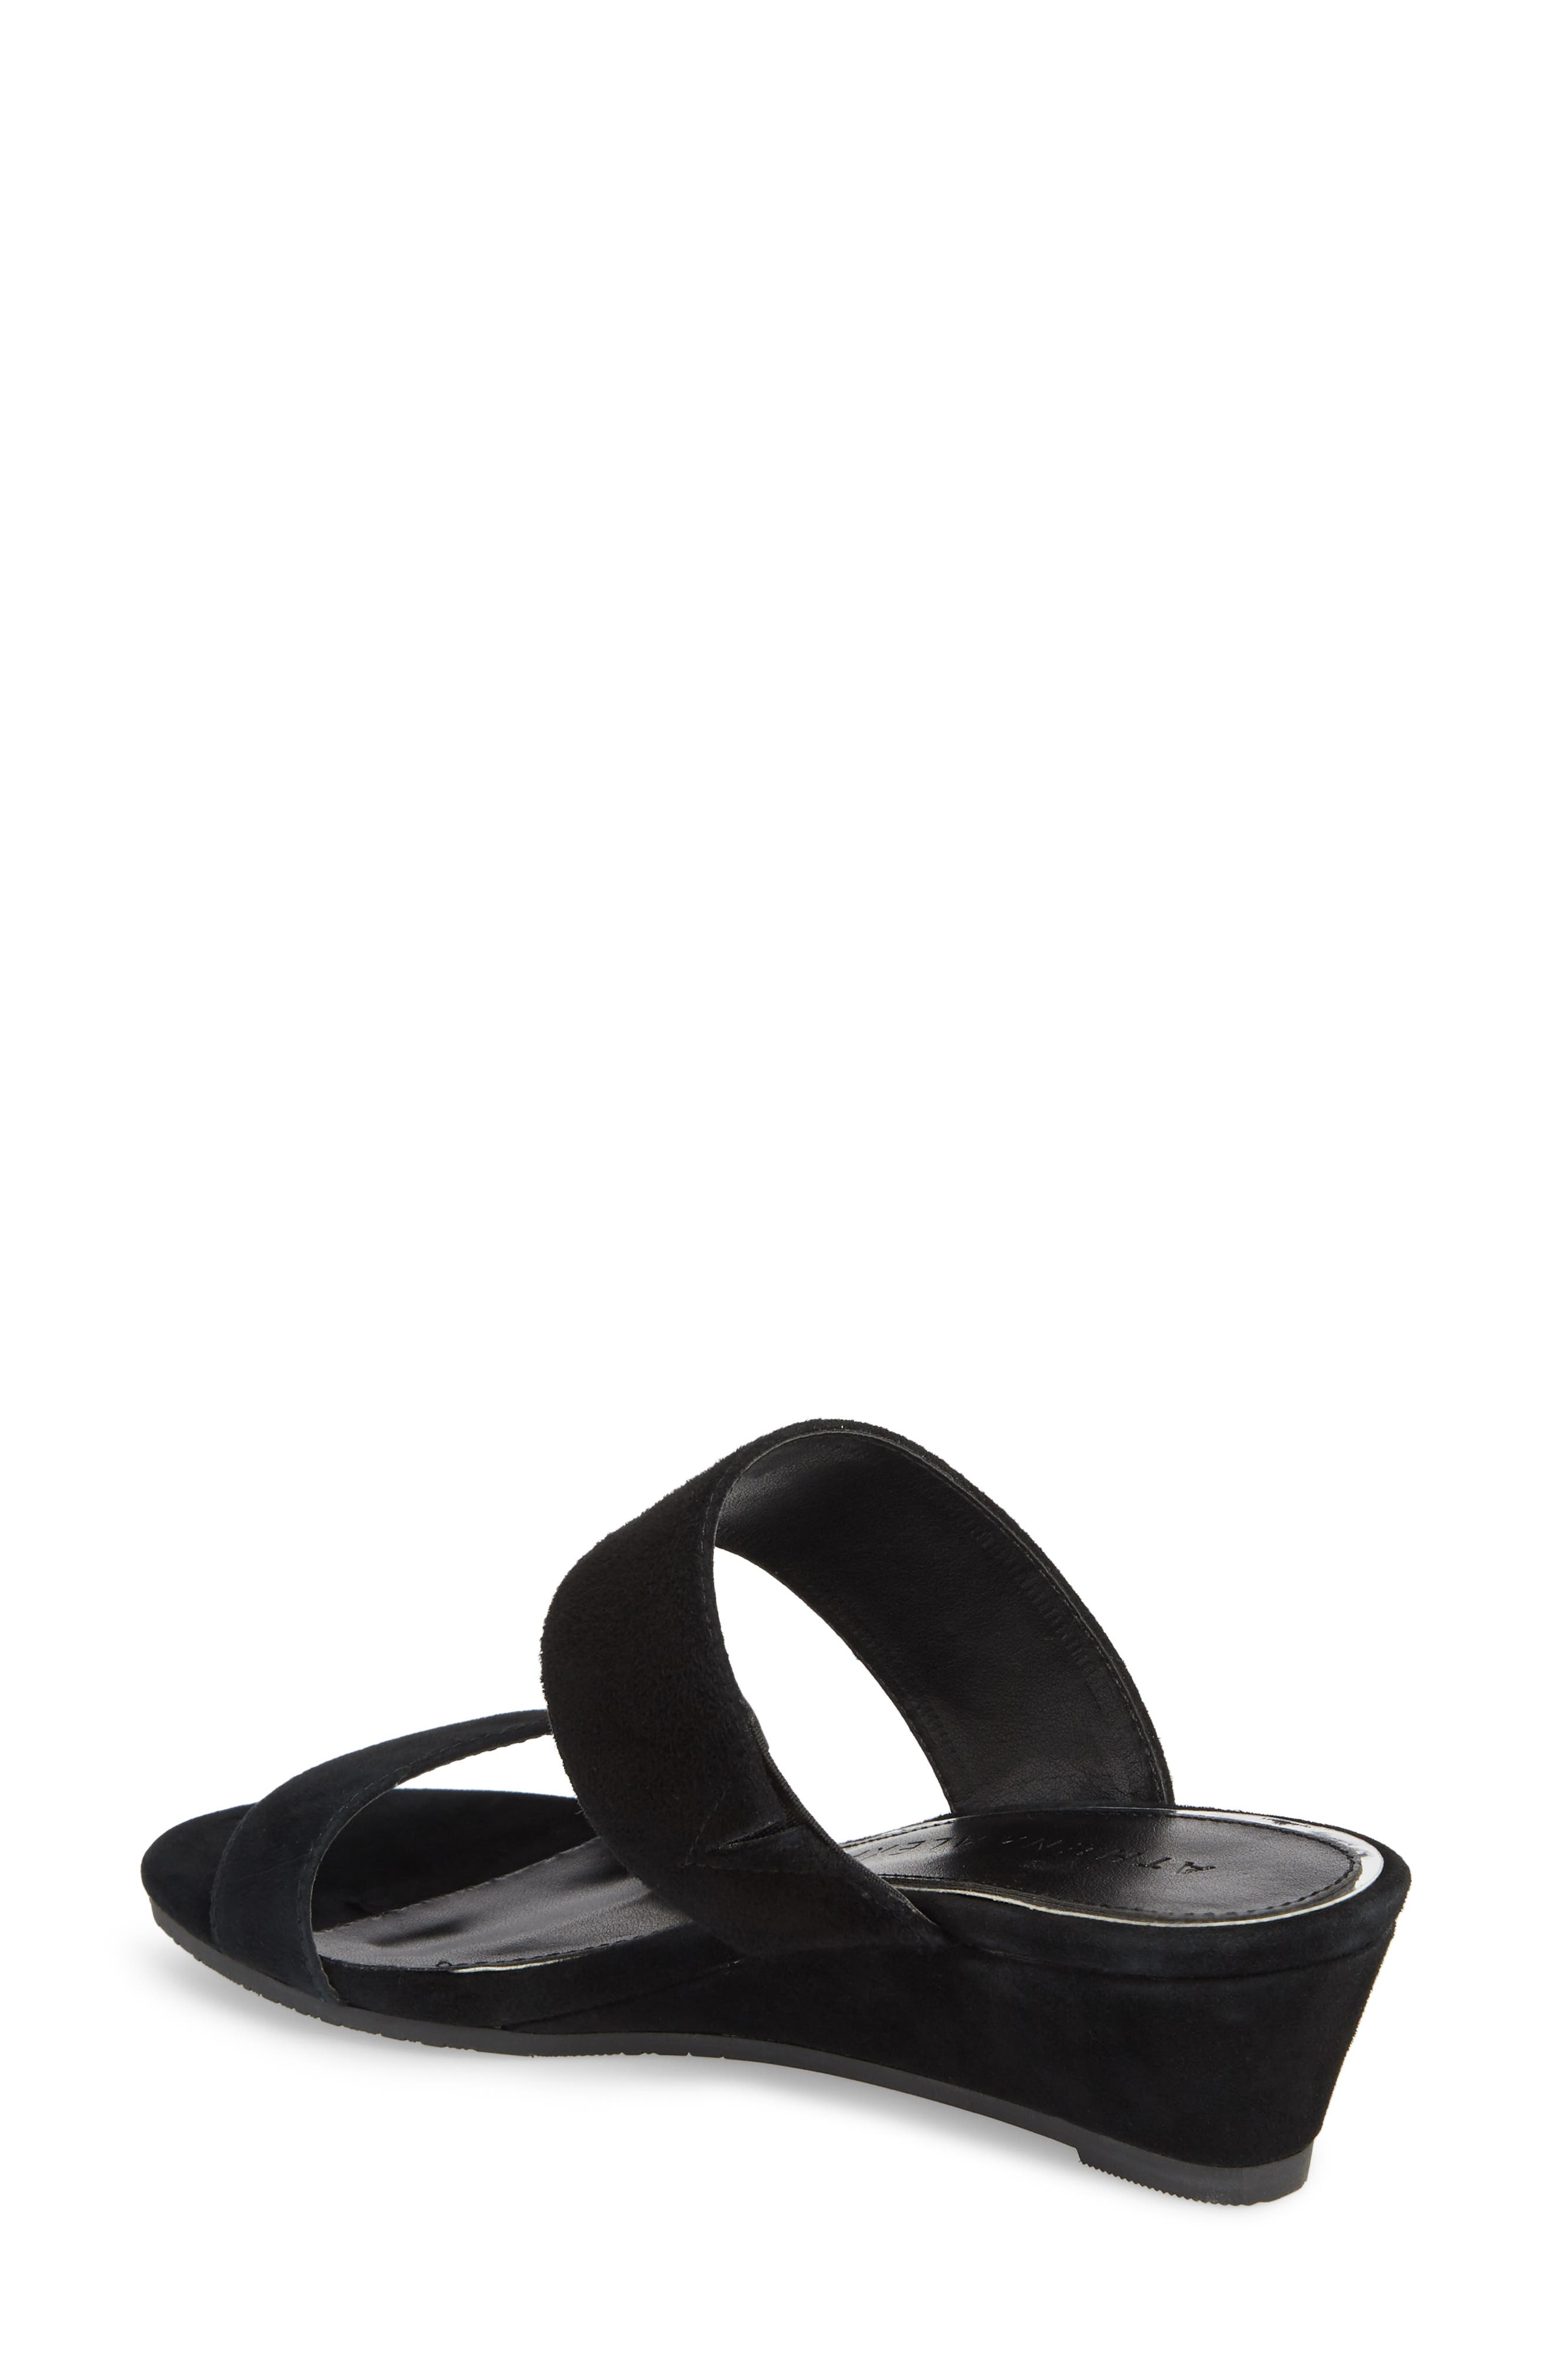 Burlington Wedge Slide Sandal,                             Alternate thumbnail 2, color,                             BLACK SUEDE